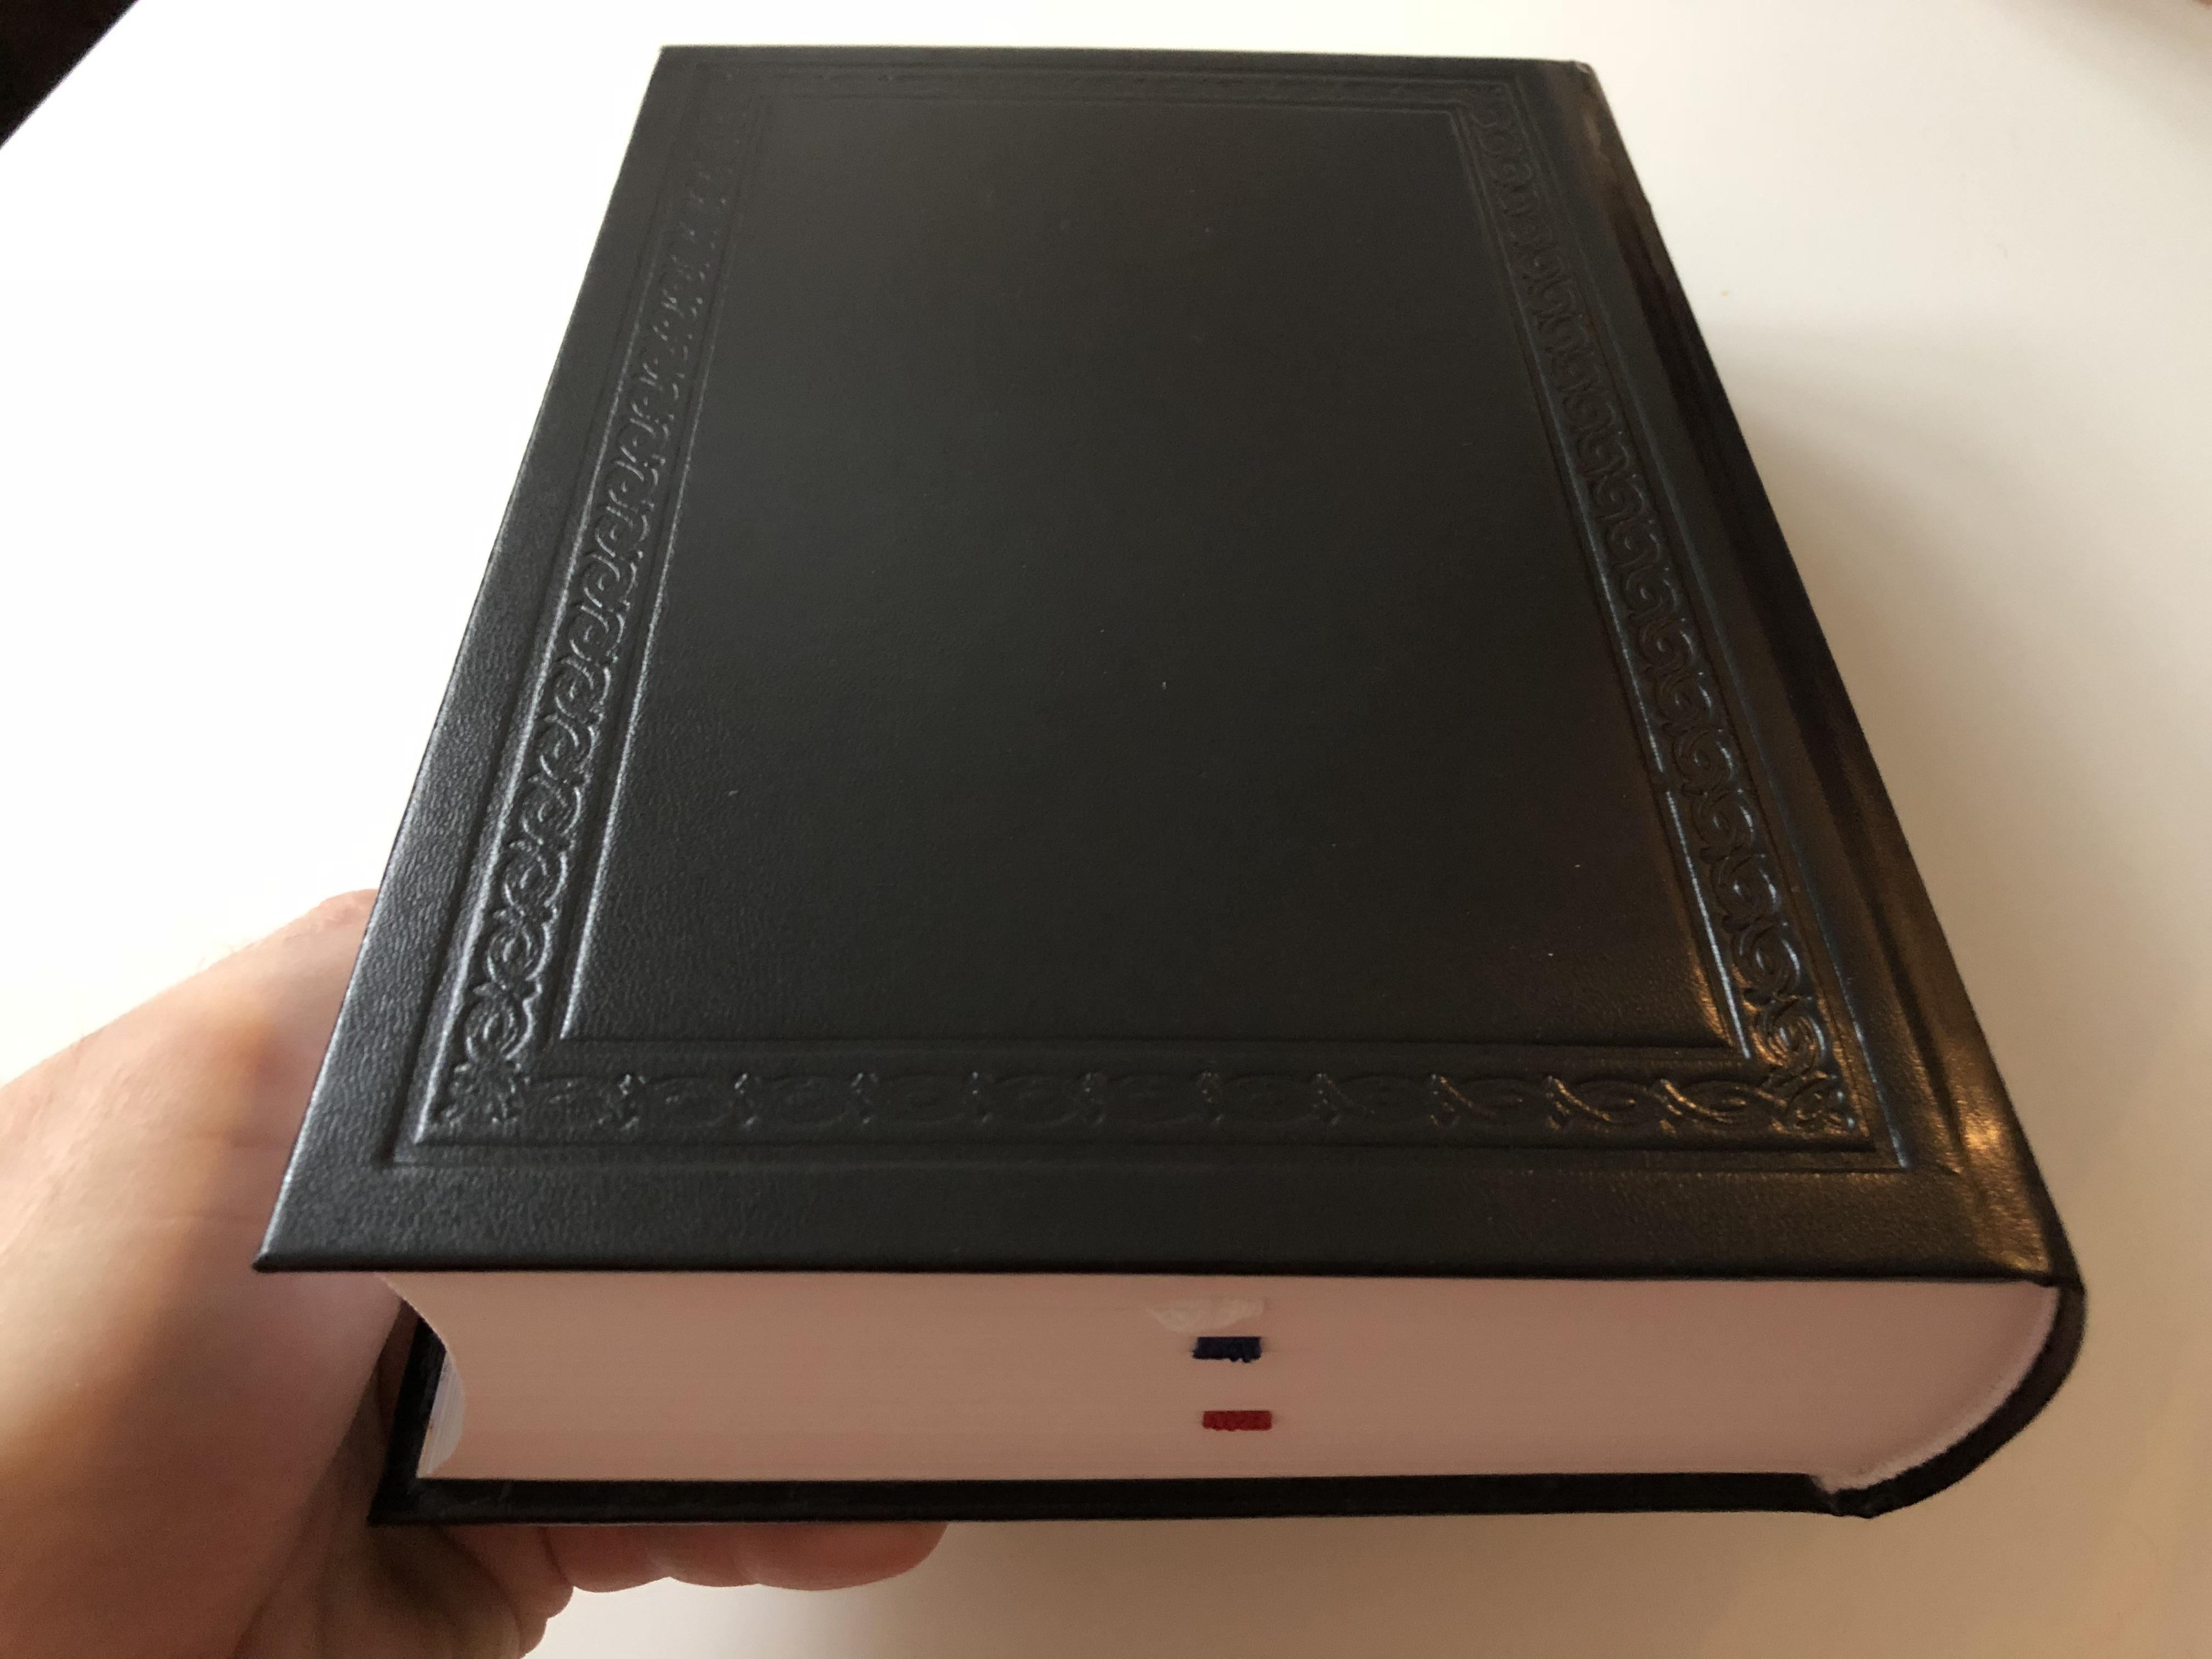 serbian-bible-black-gold-etched-deuterocanonical-18-.jpg